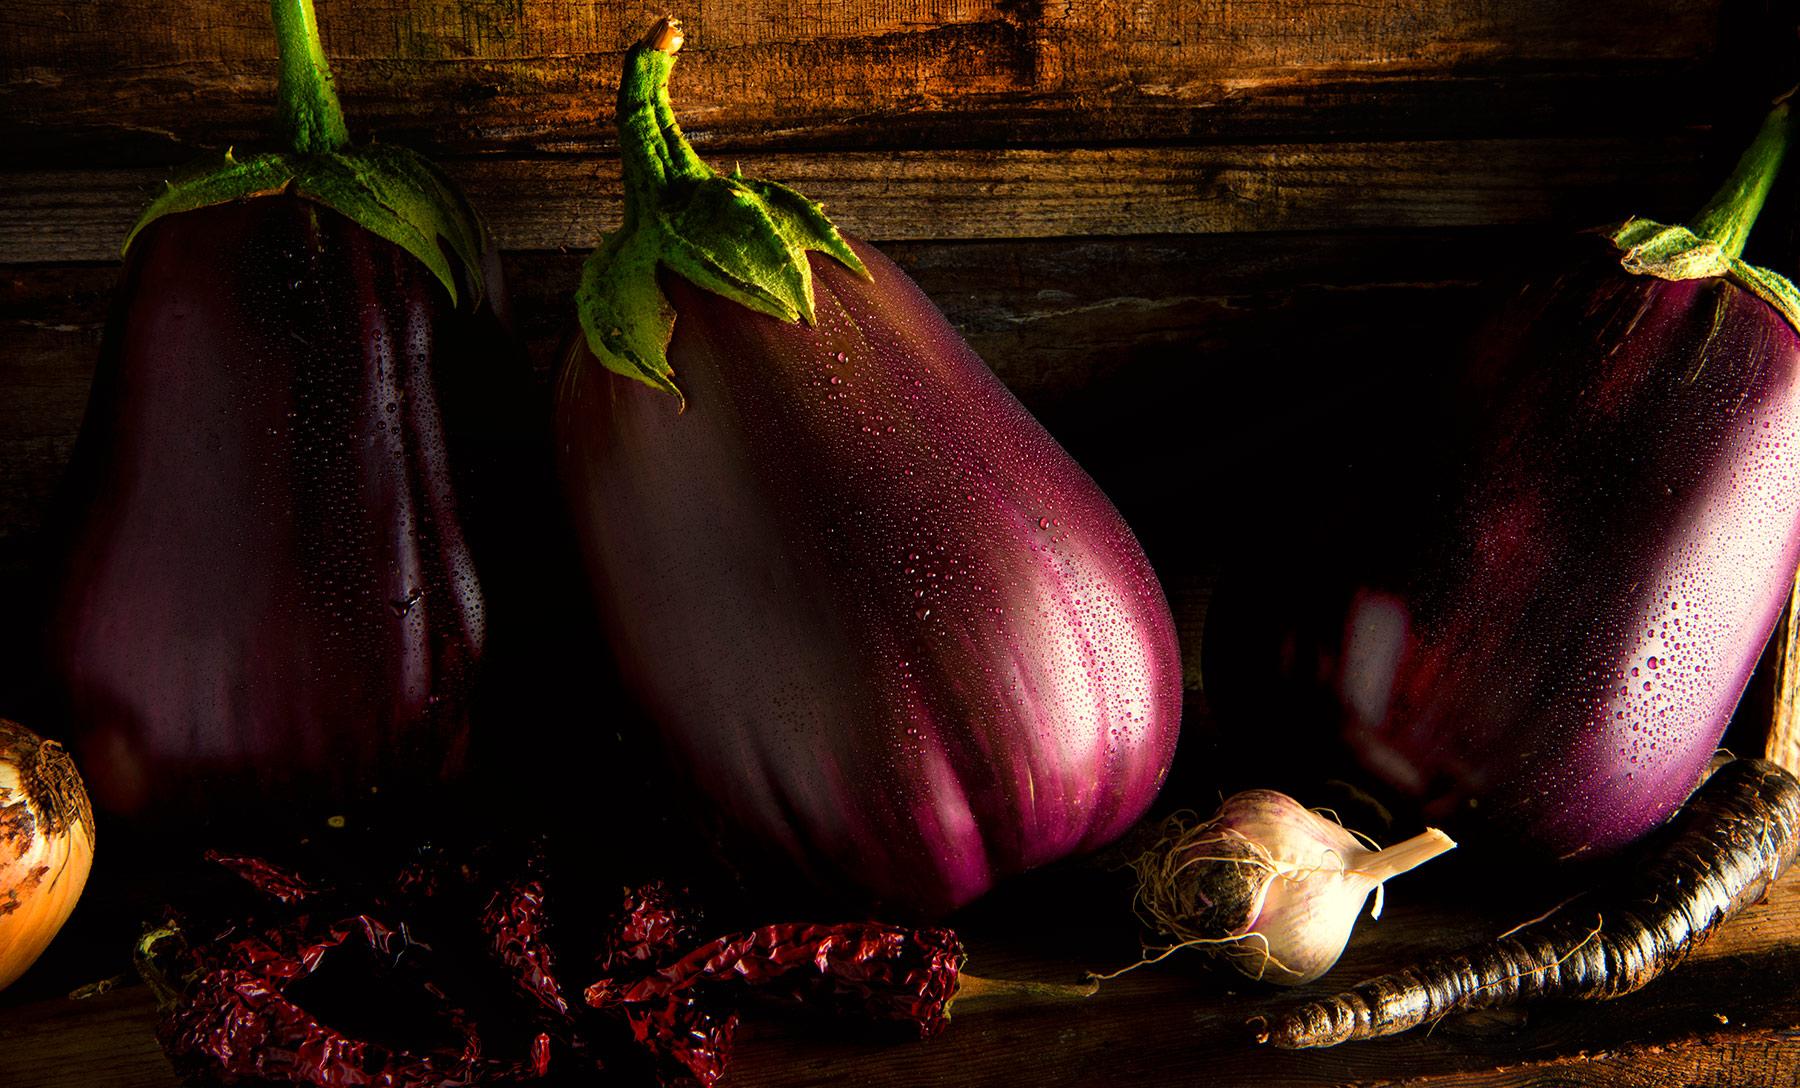 Eggplant-Carl Kravats Food Photography